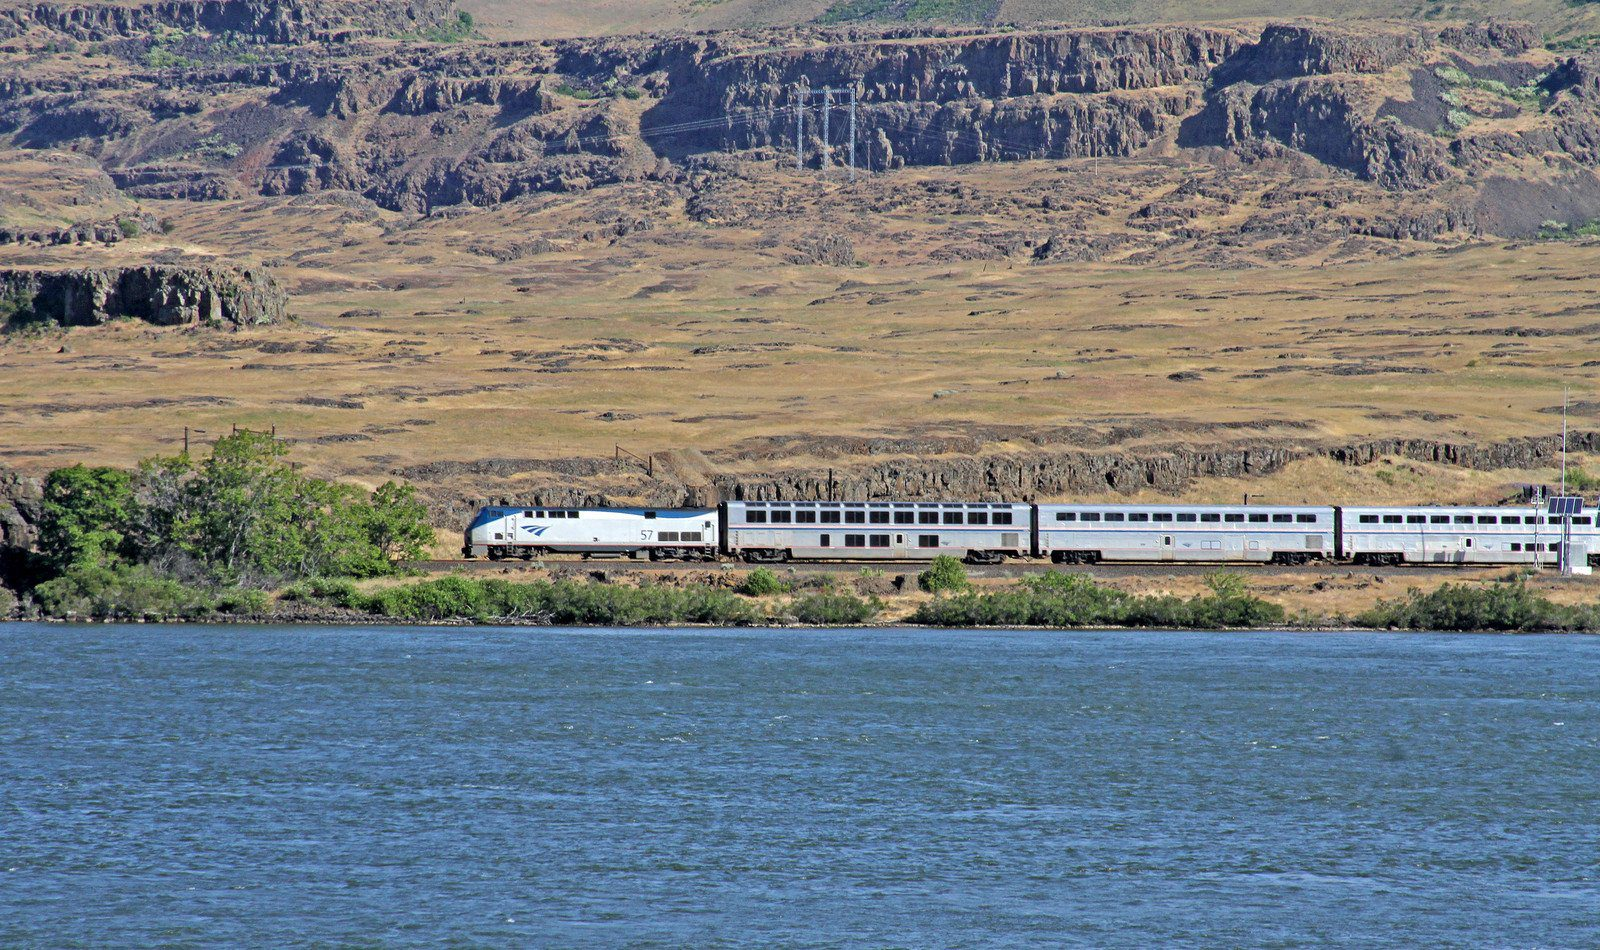 Amtrak Train in North America